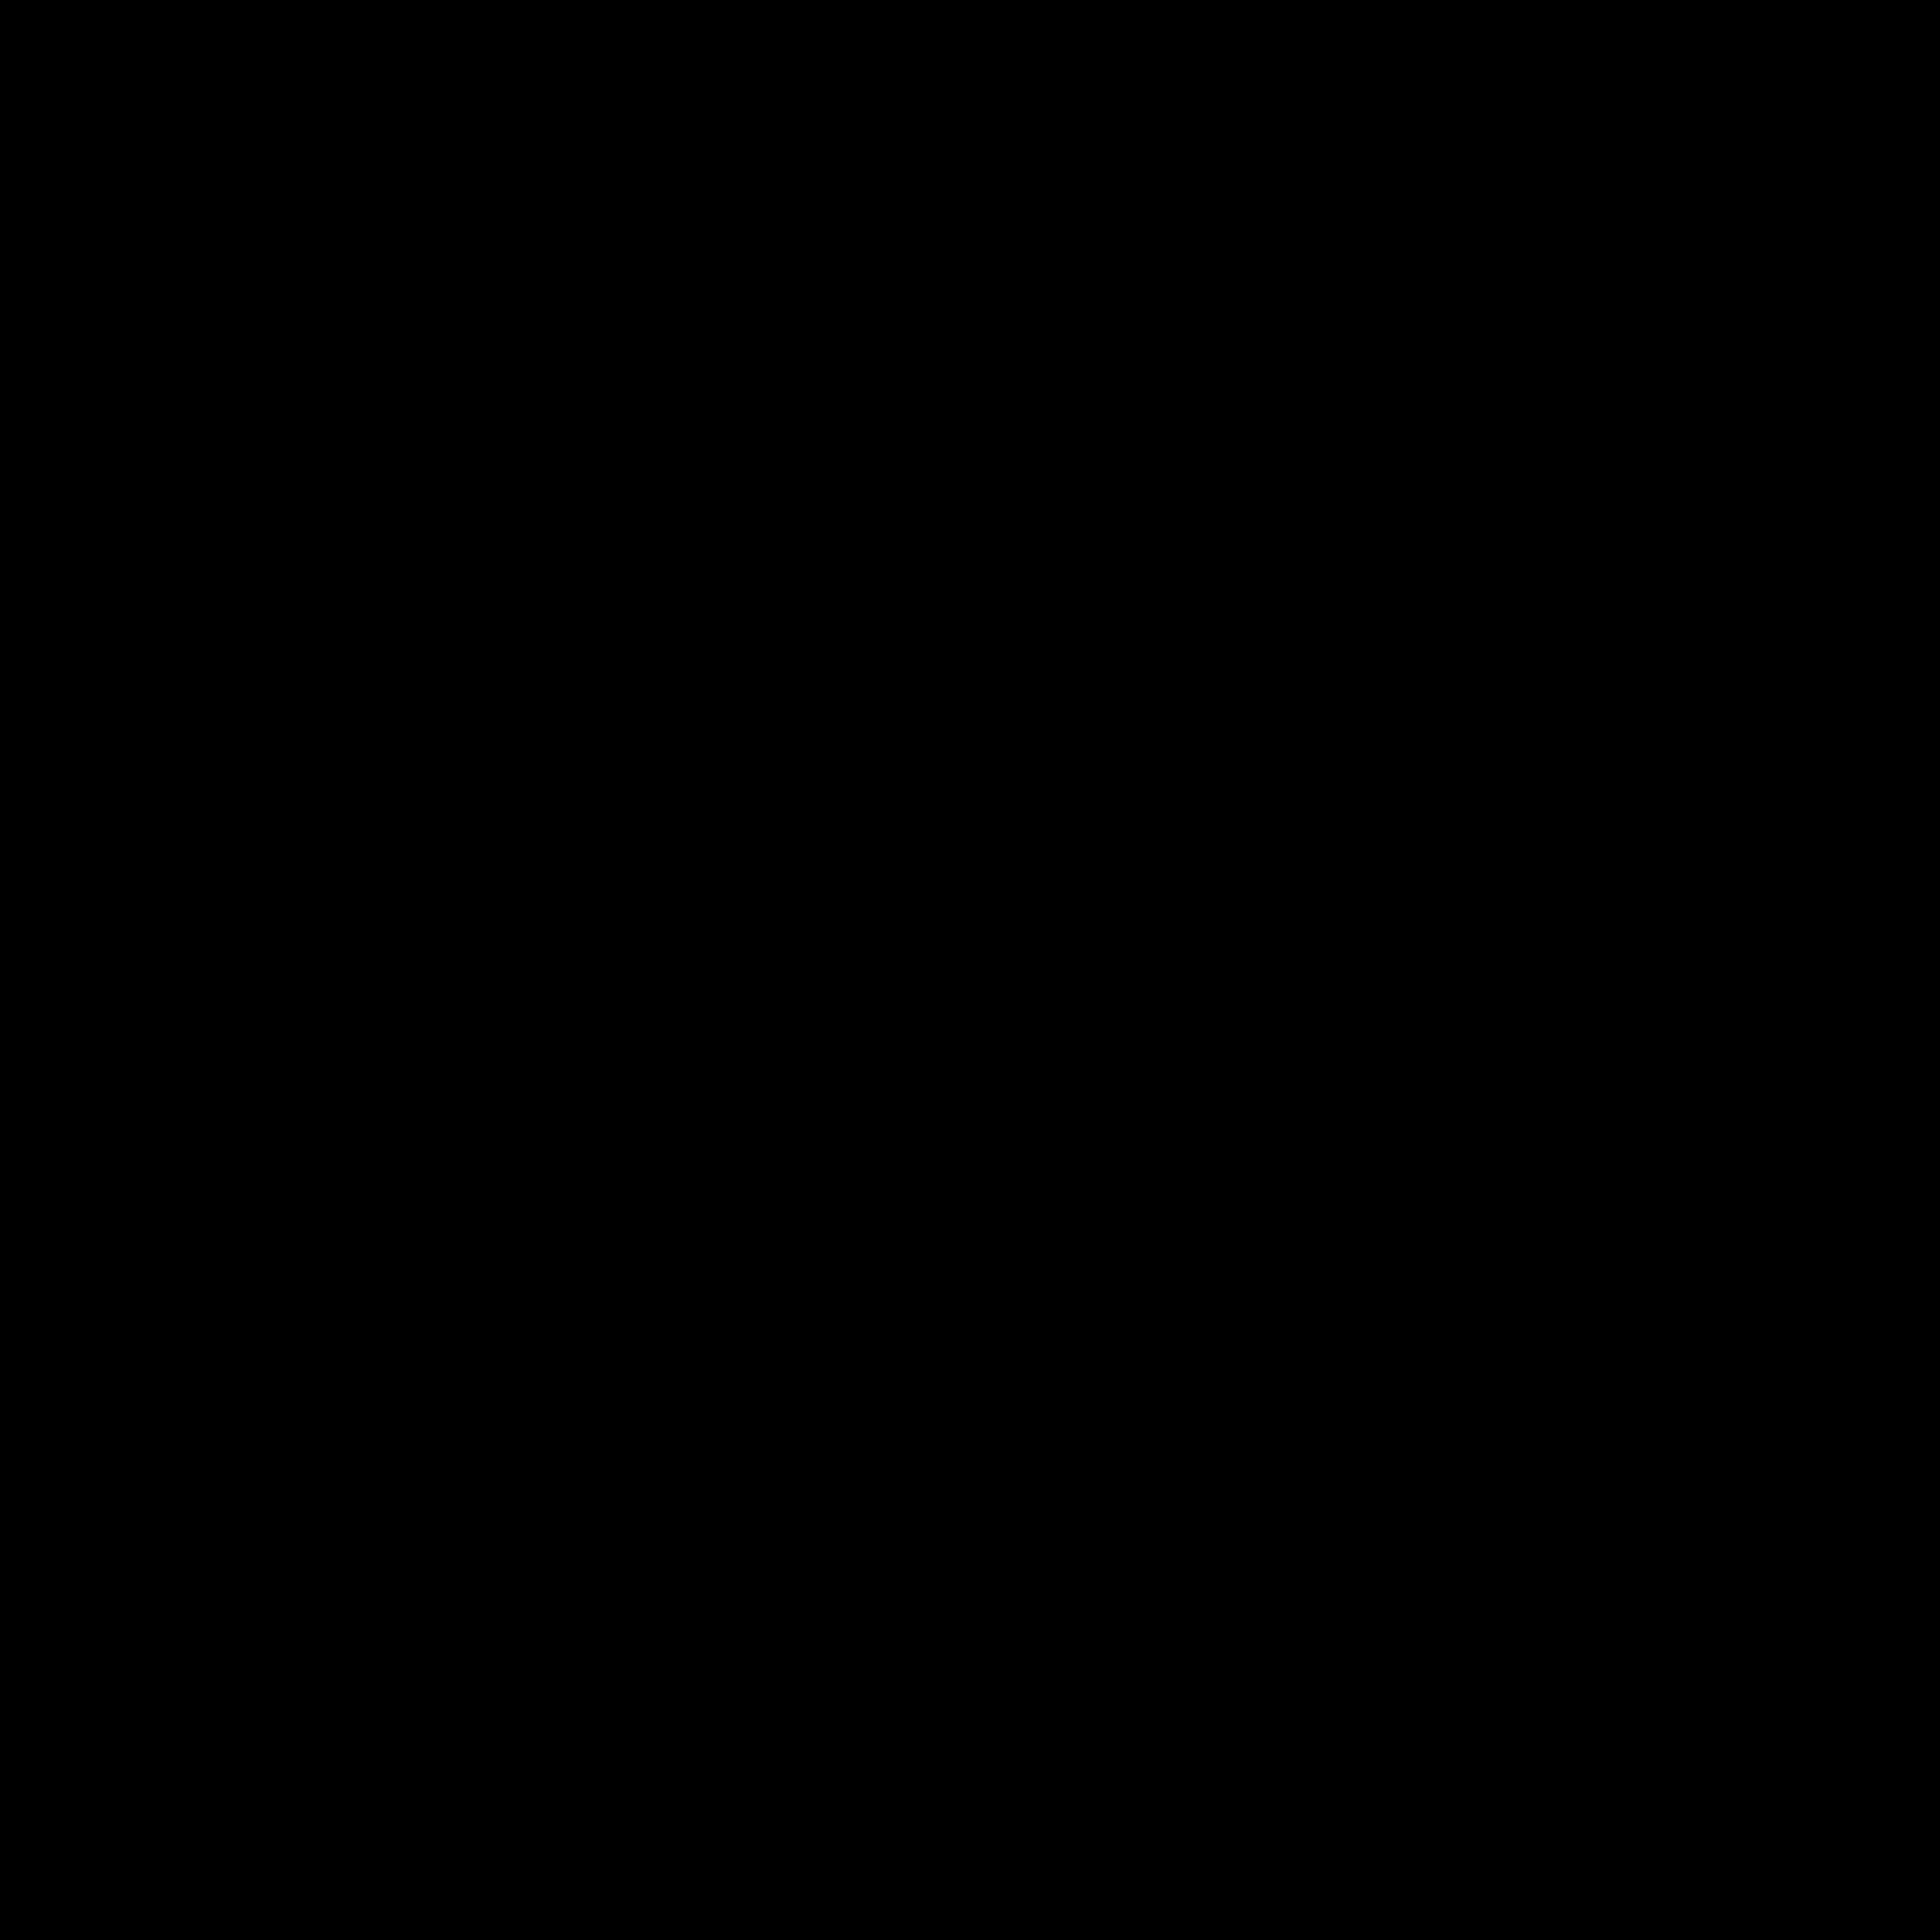 dropbox, black icon